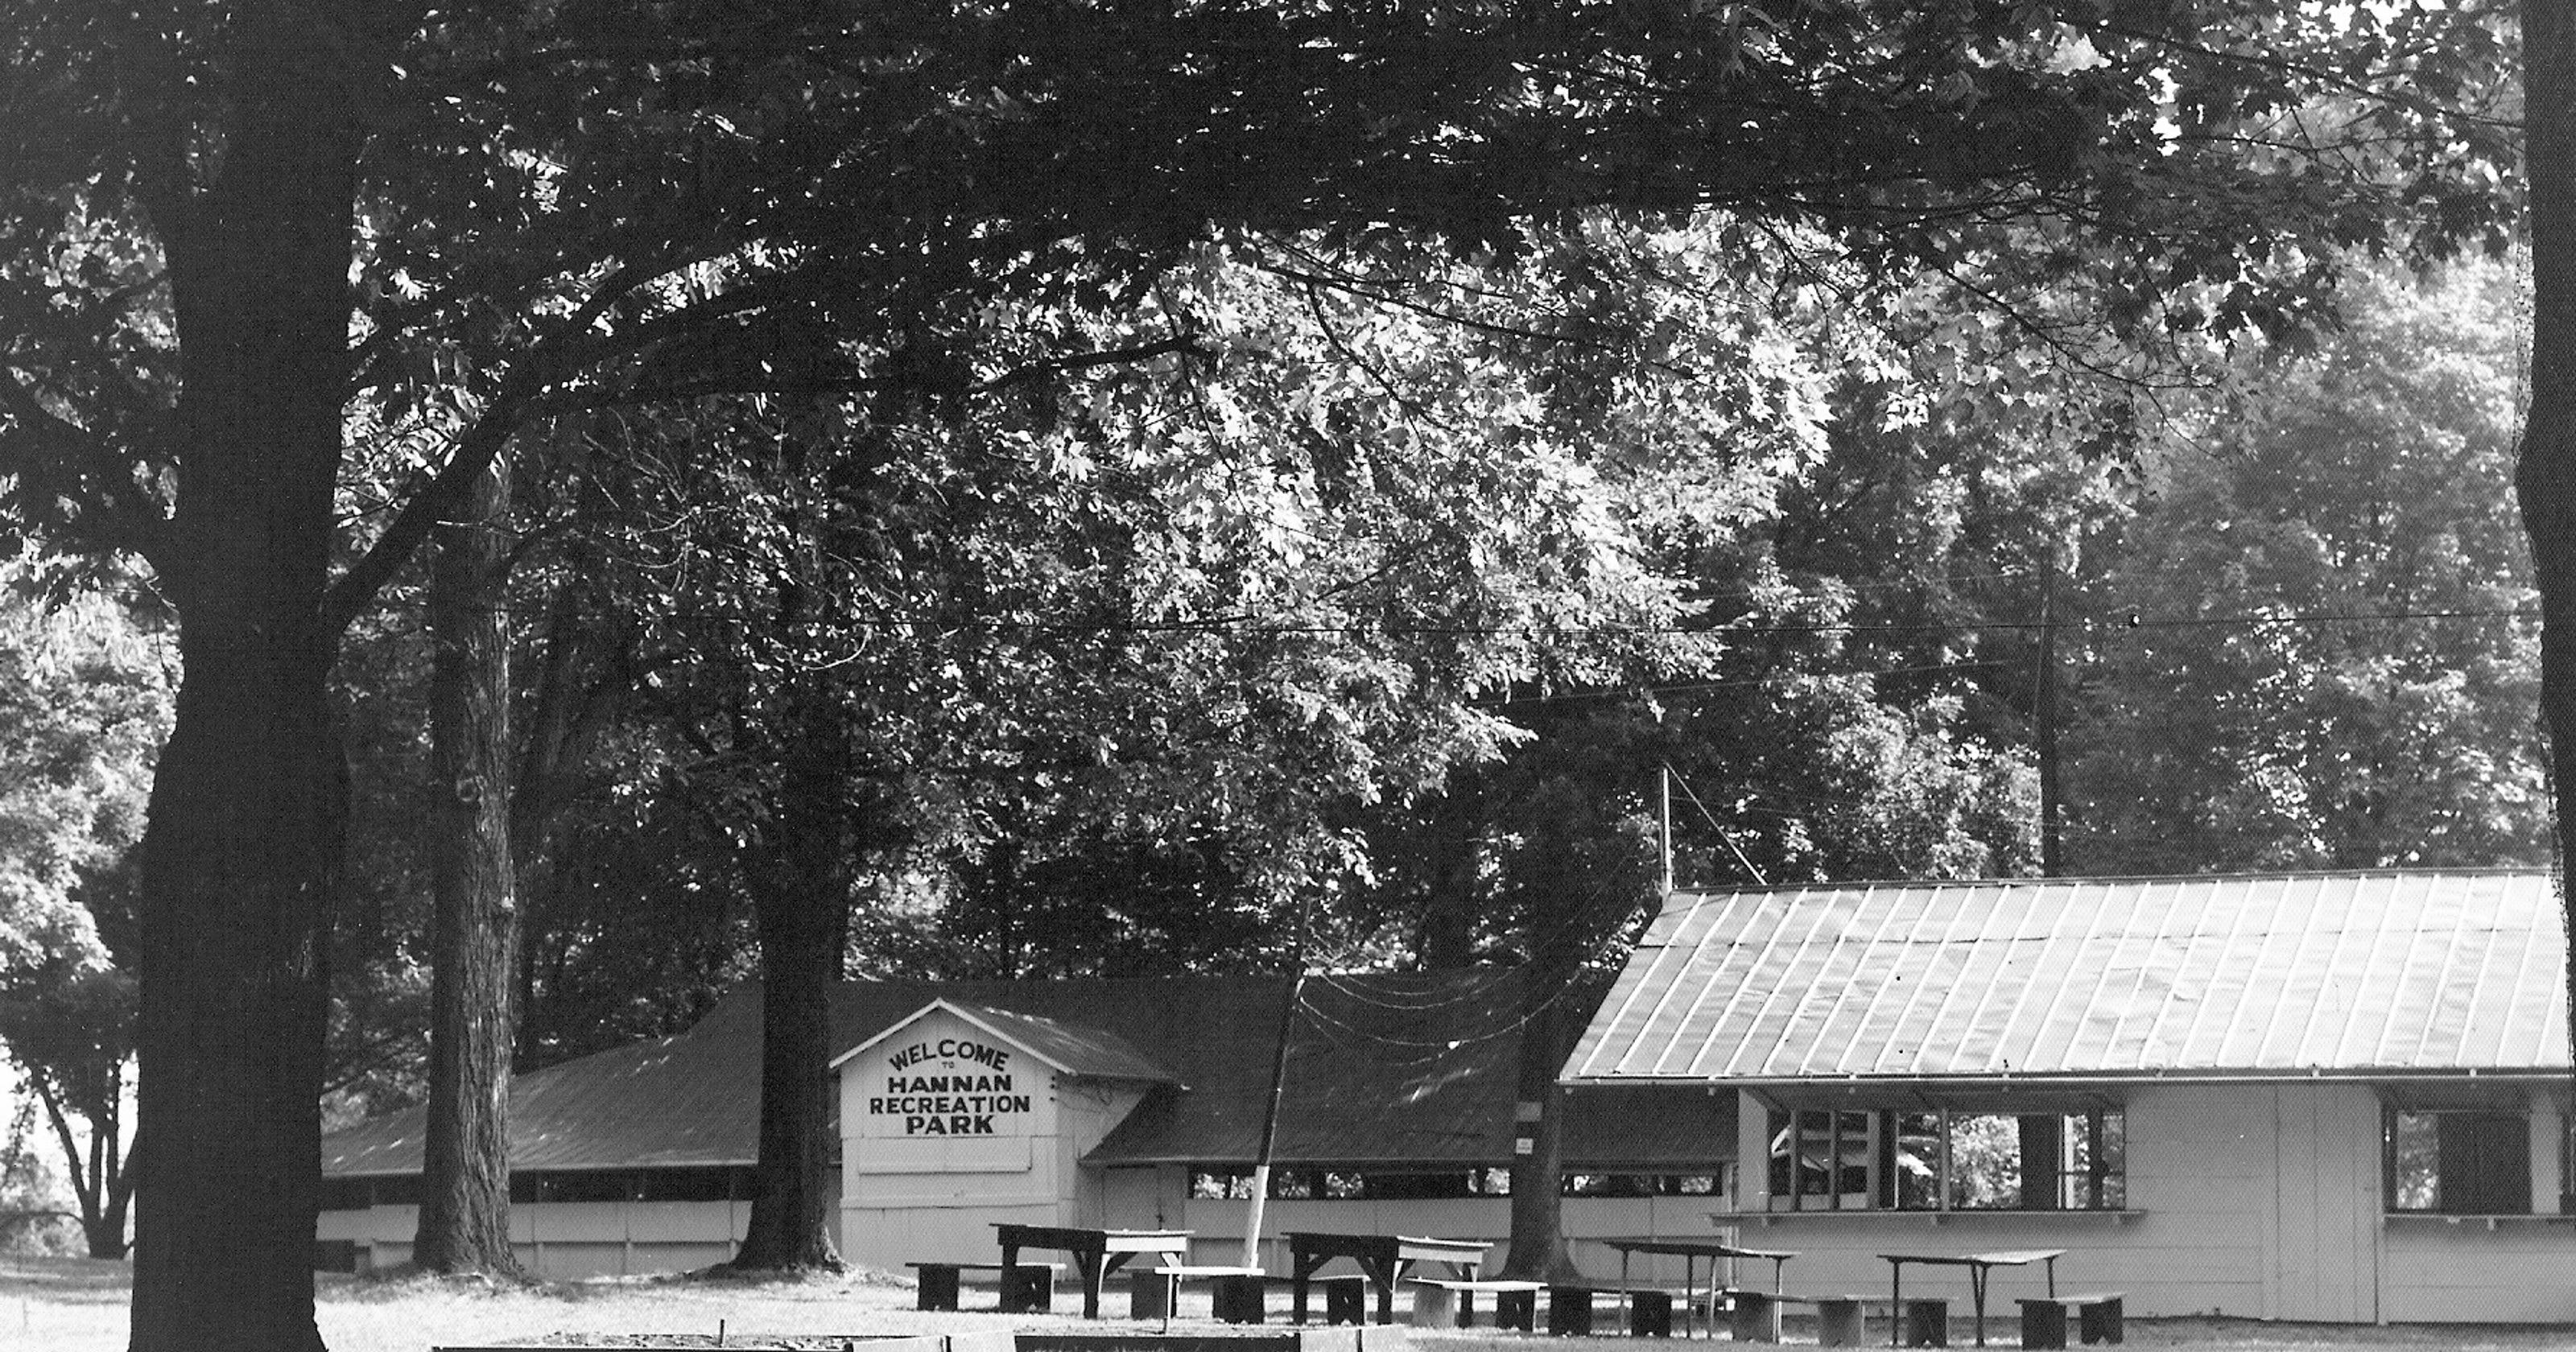 Buckeye Park's last 100 years